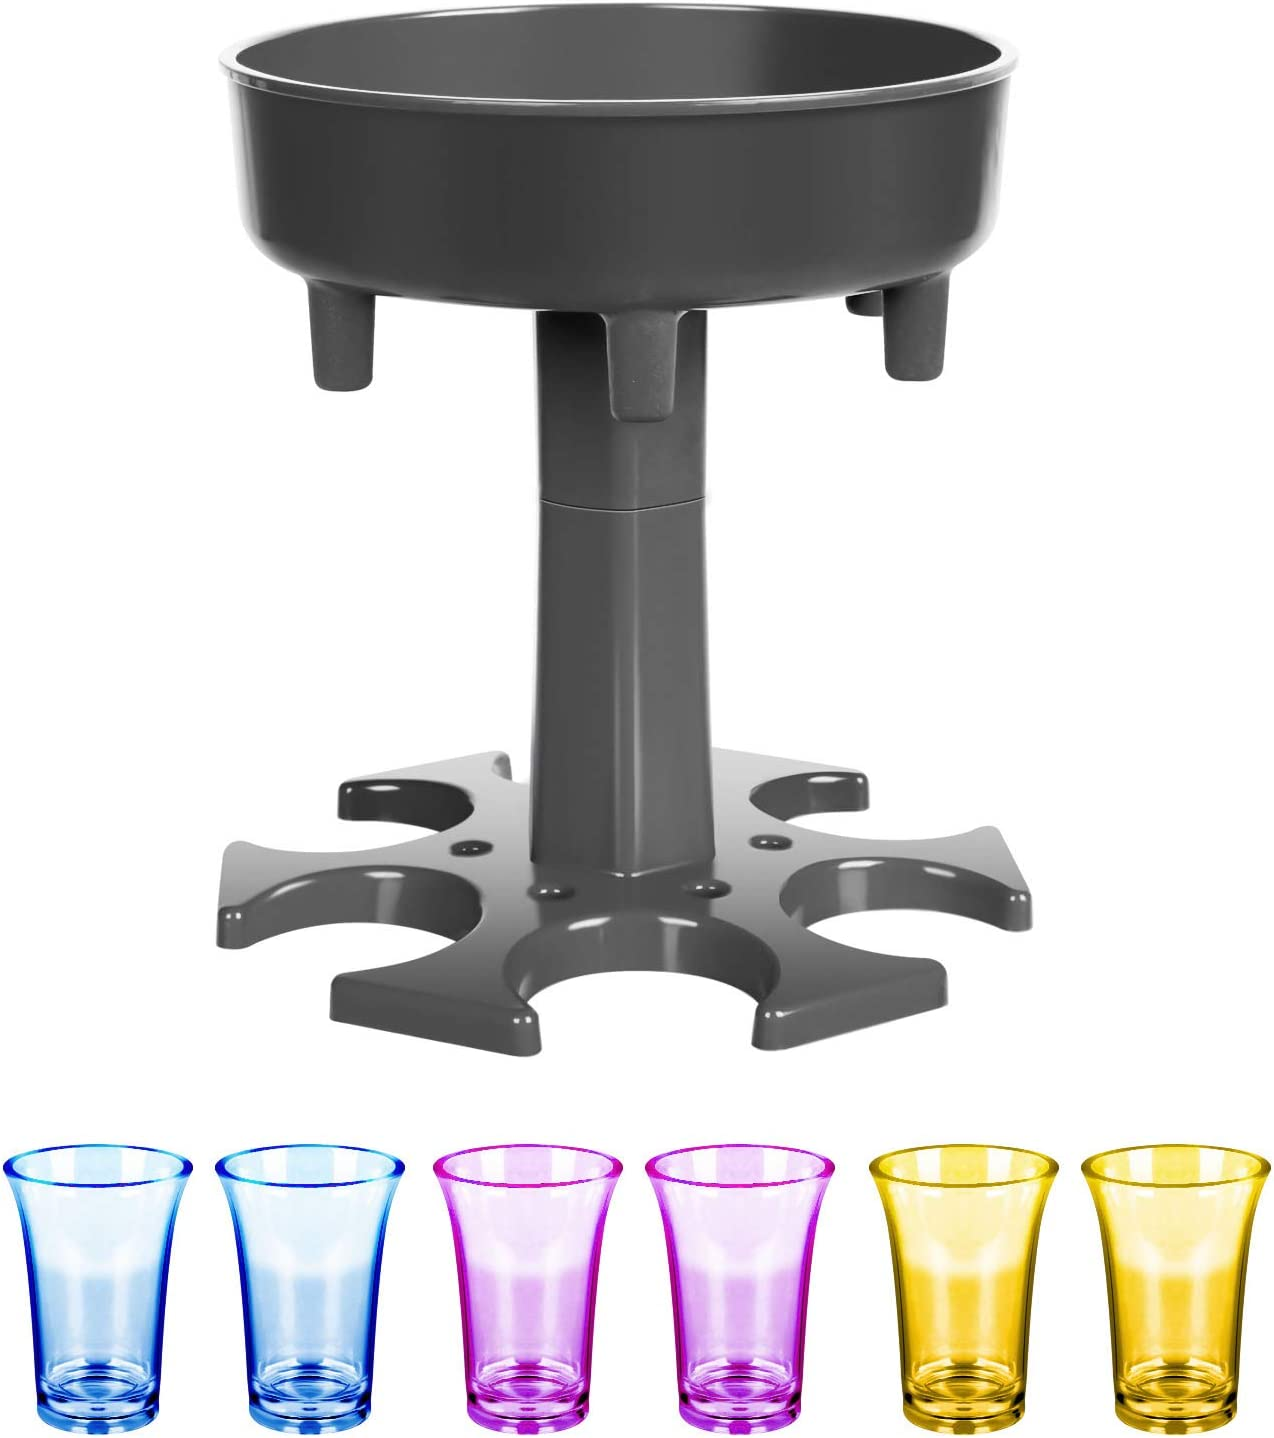 6 Shot Glass Dispenser and Holder, Carrier Caddy Liquor Dispenser, Beverage Dispenser with 6 Cups for Parties Drinking & Bar